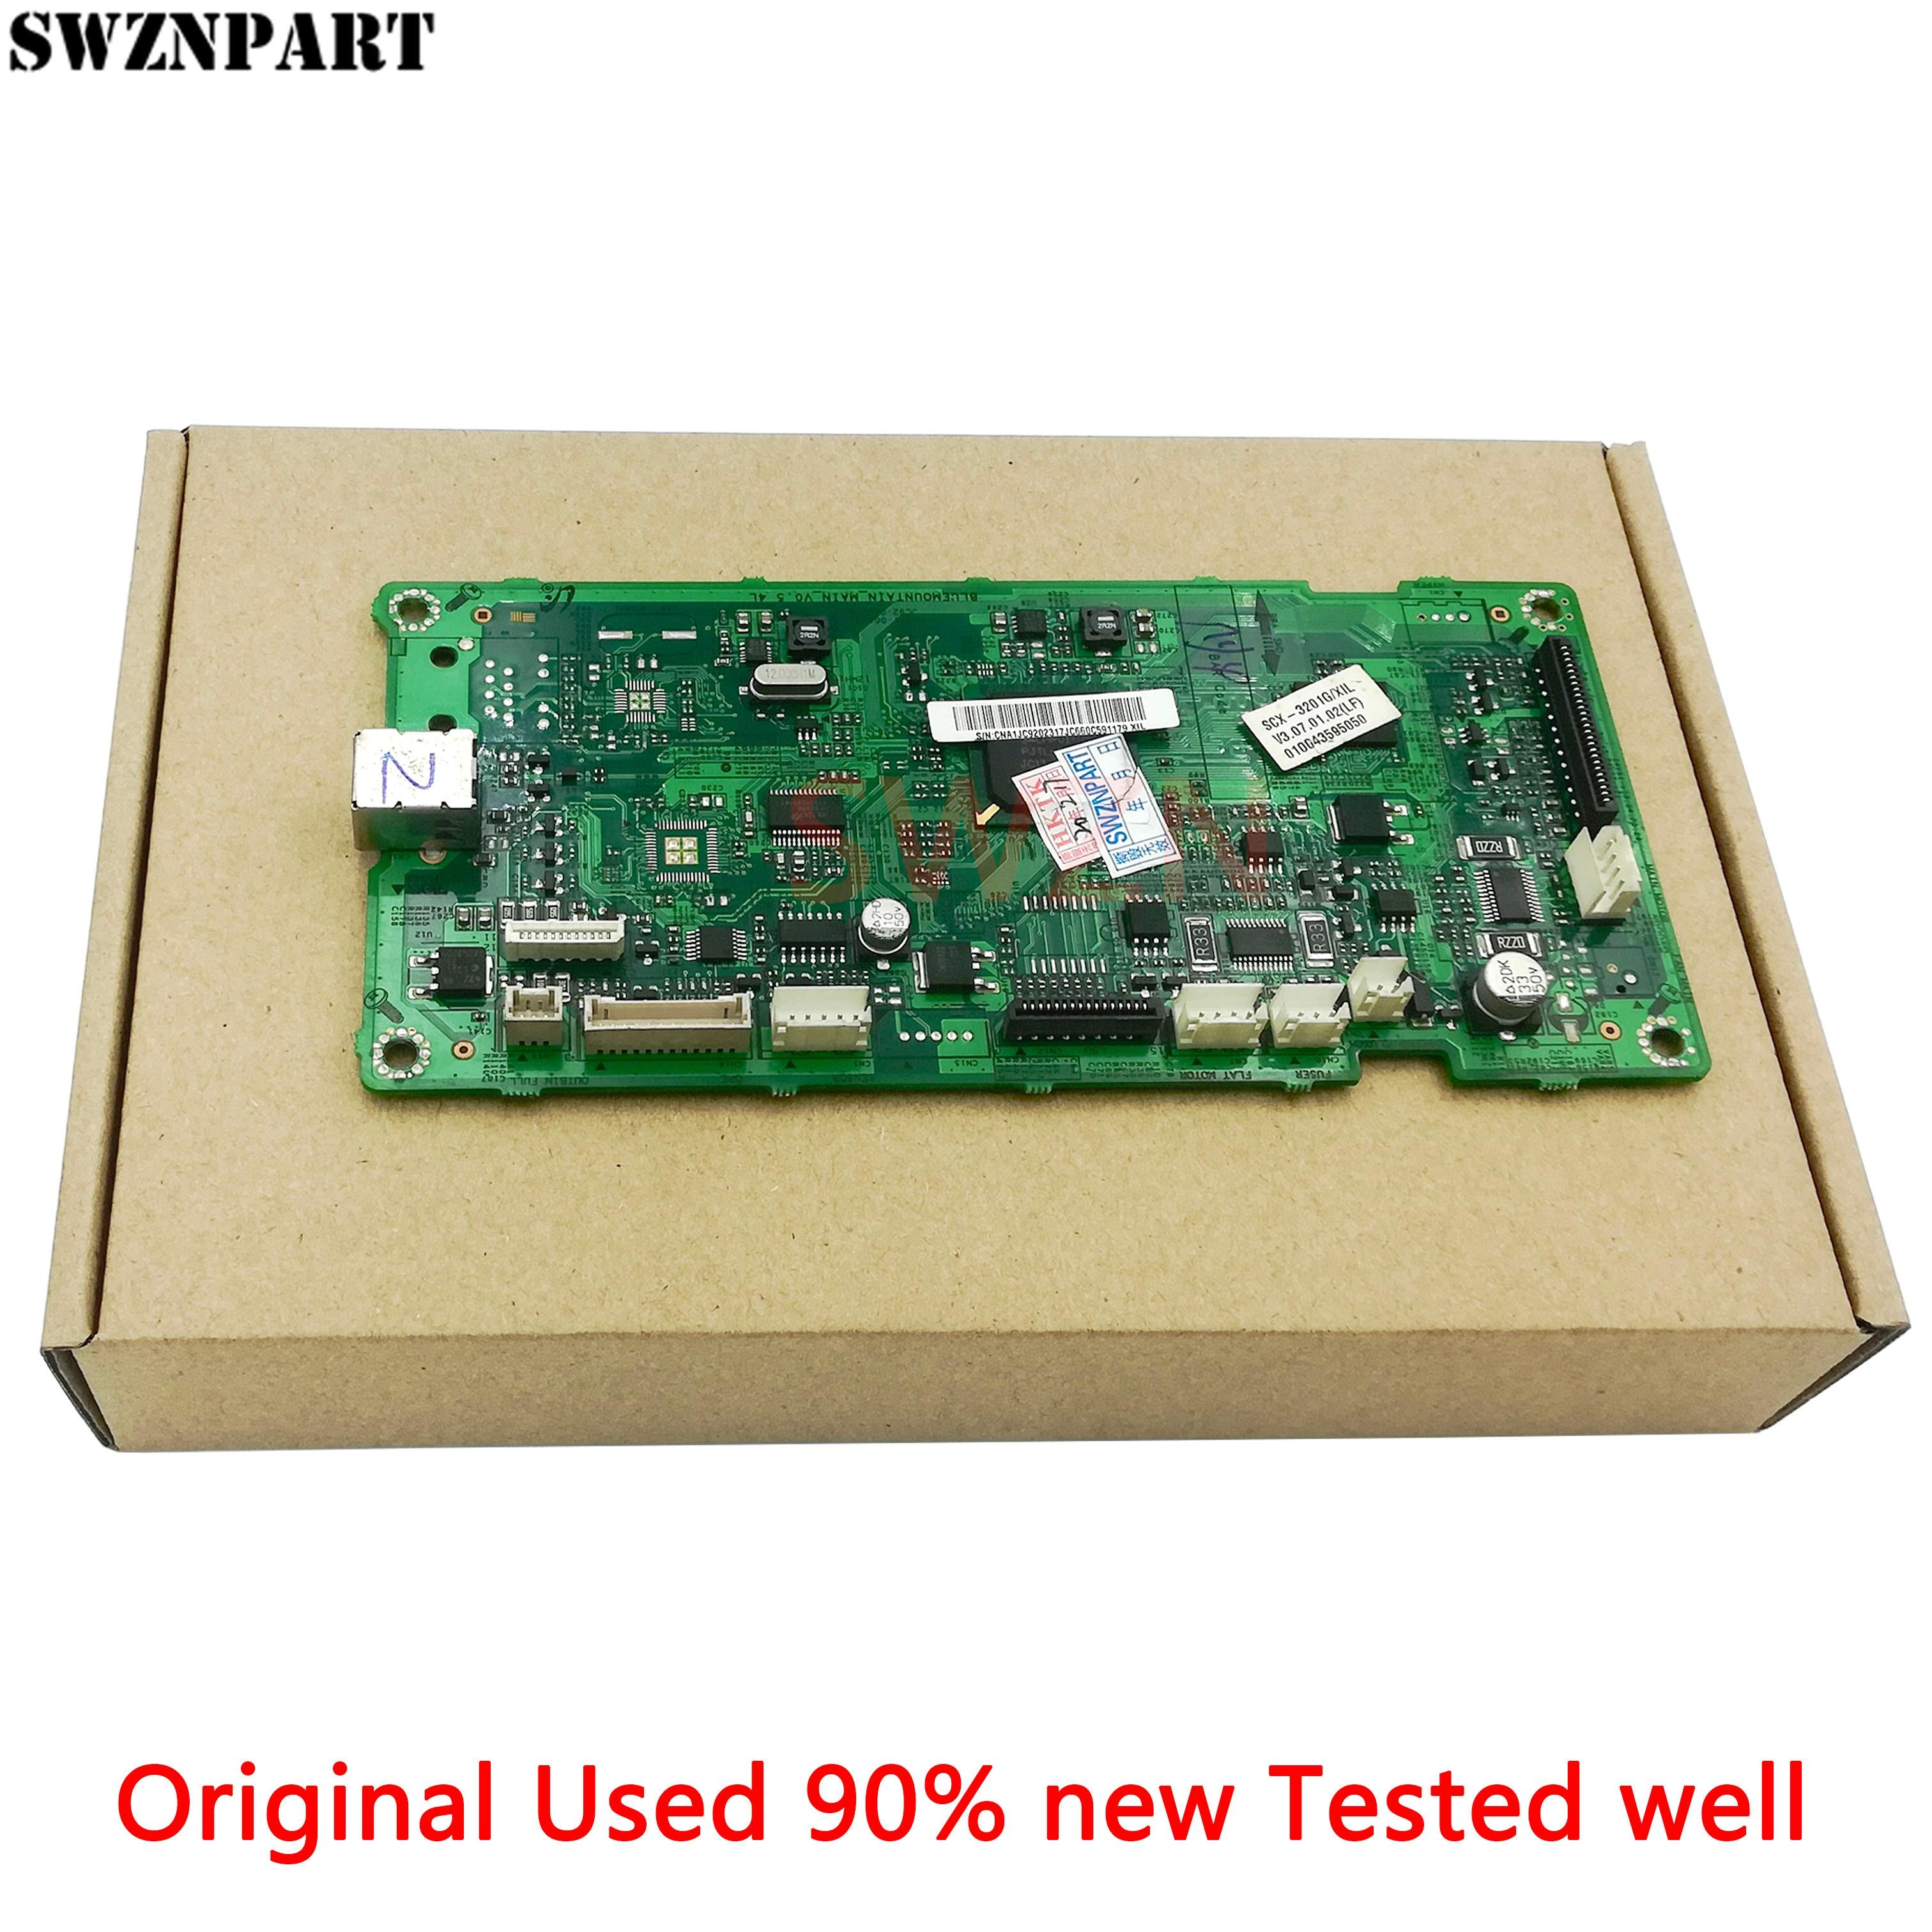 FORMATTER PCA ASSY Formatter Board Logic Main Board MainBoard For Samsung SCX-3200 SCX-3201 SCX-3208 SCX-3205 SCX-3206 3201 3200